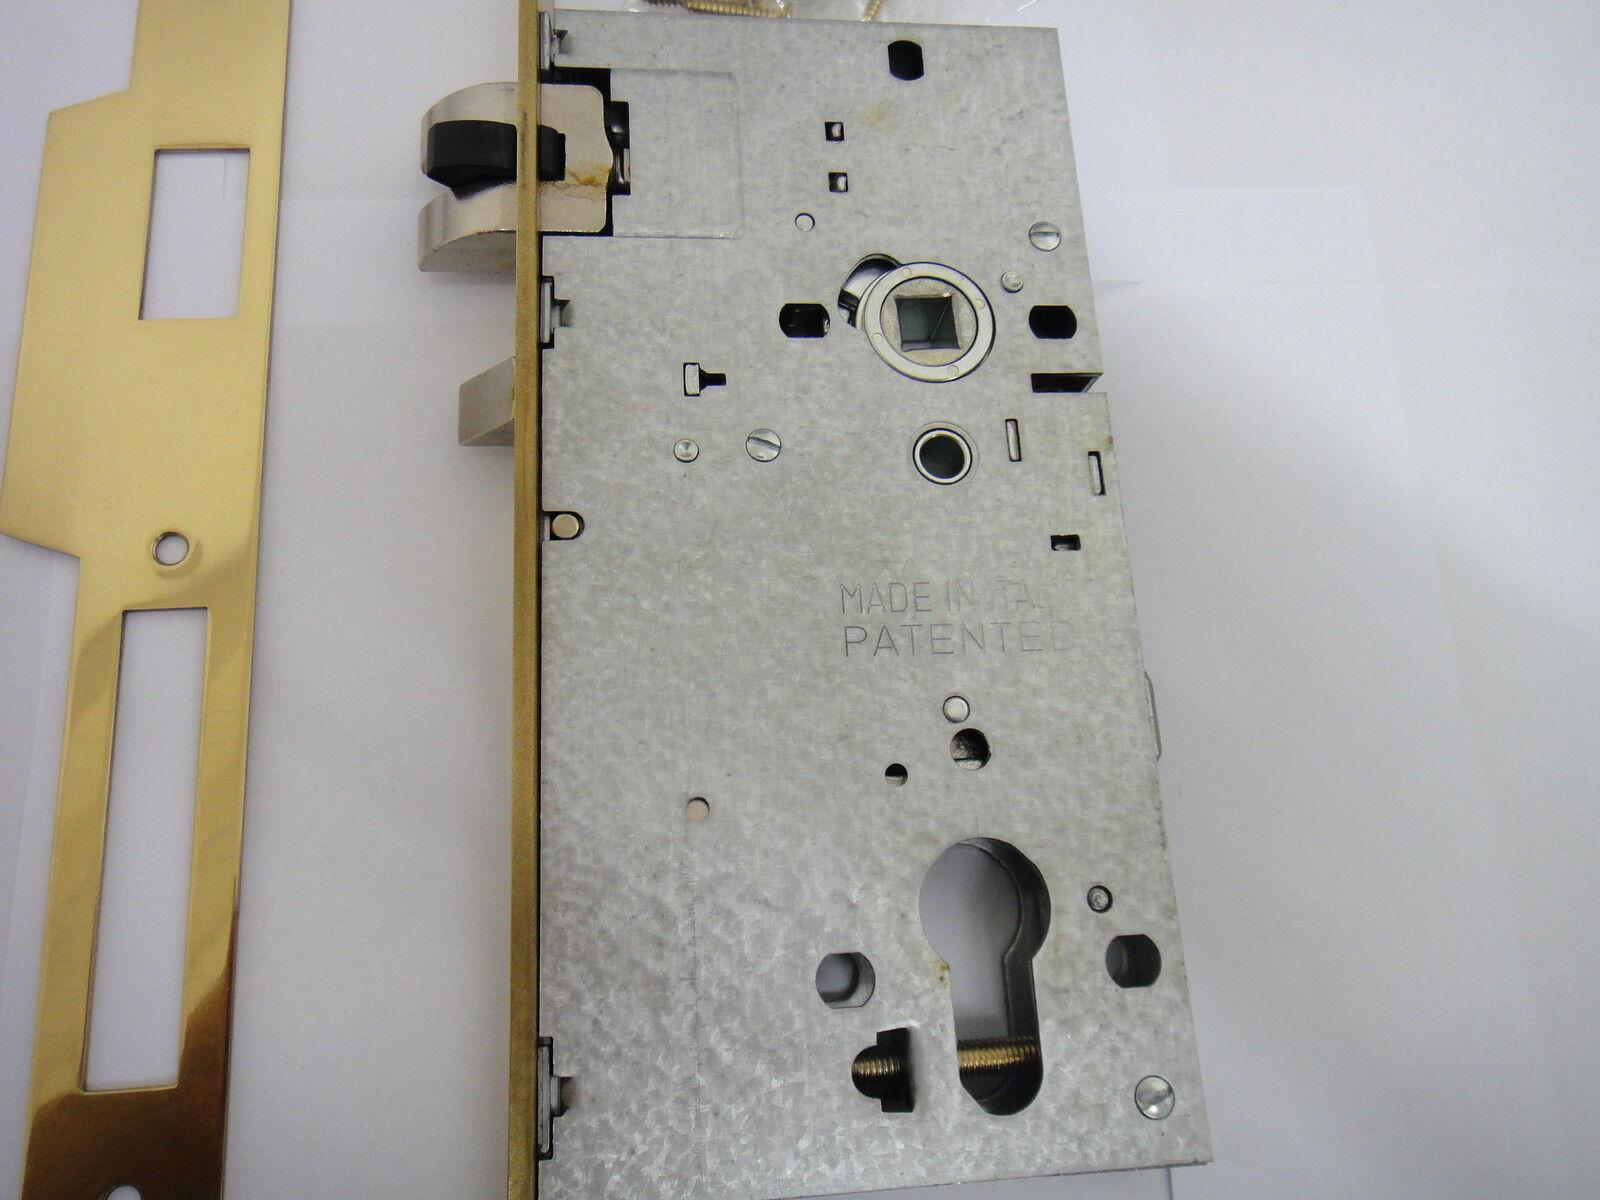 CISA EURO PROFILE LOCK CASE FOR ESCAPE// PANIC FUNCTION DOORS 43130-65 CHROME NEW